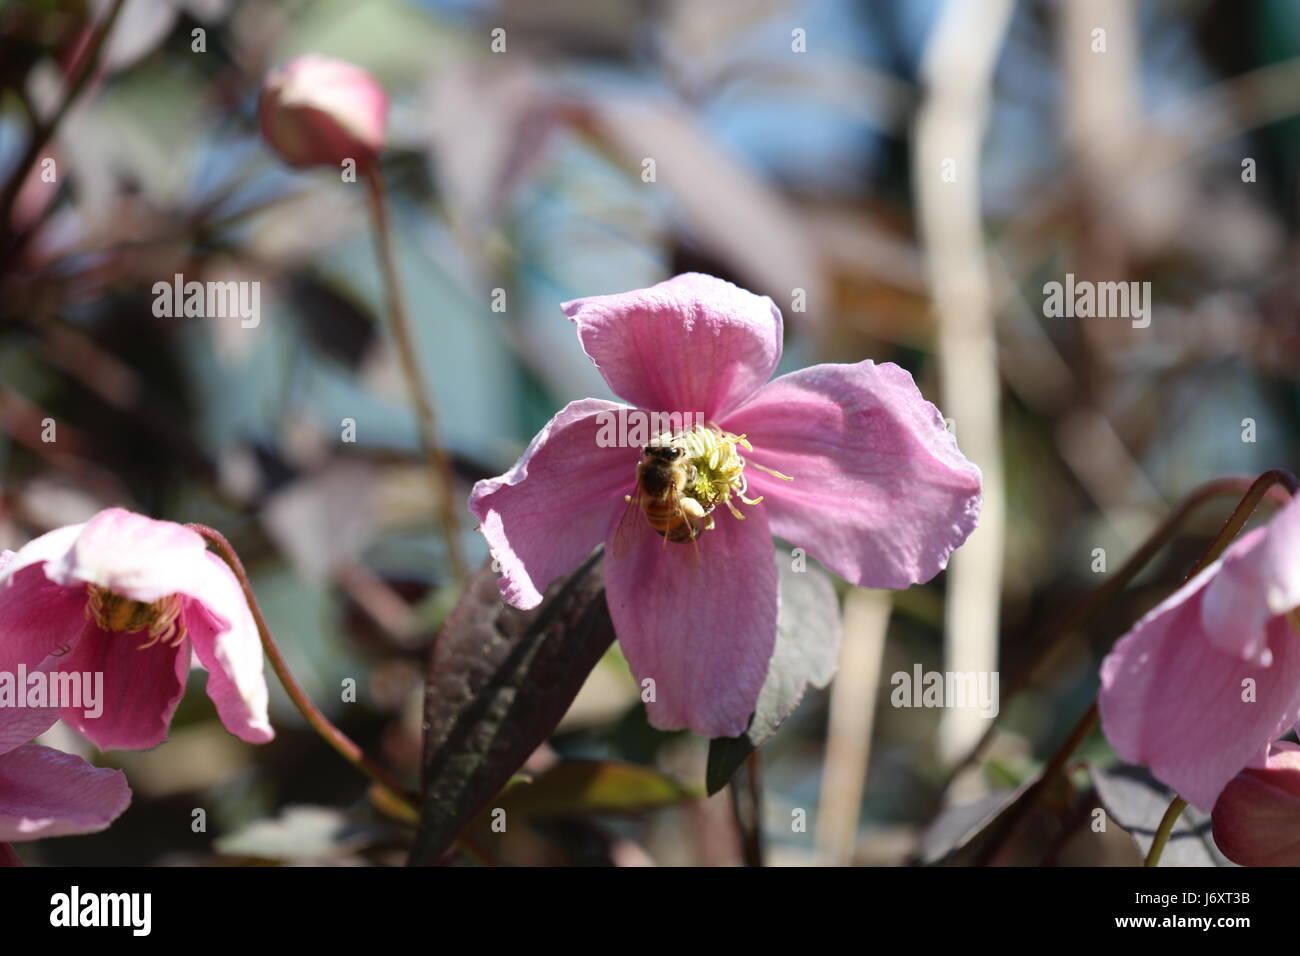 Blume mit Insekt - Stock Image